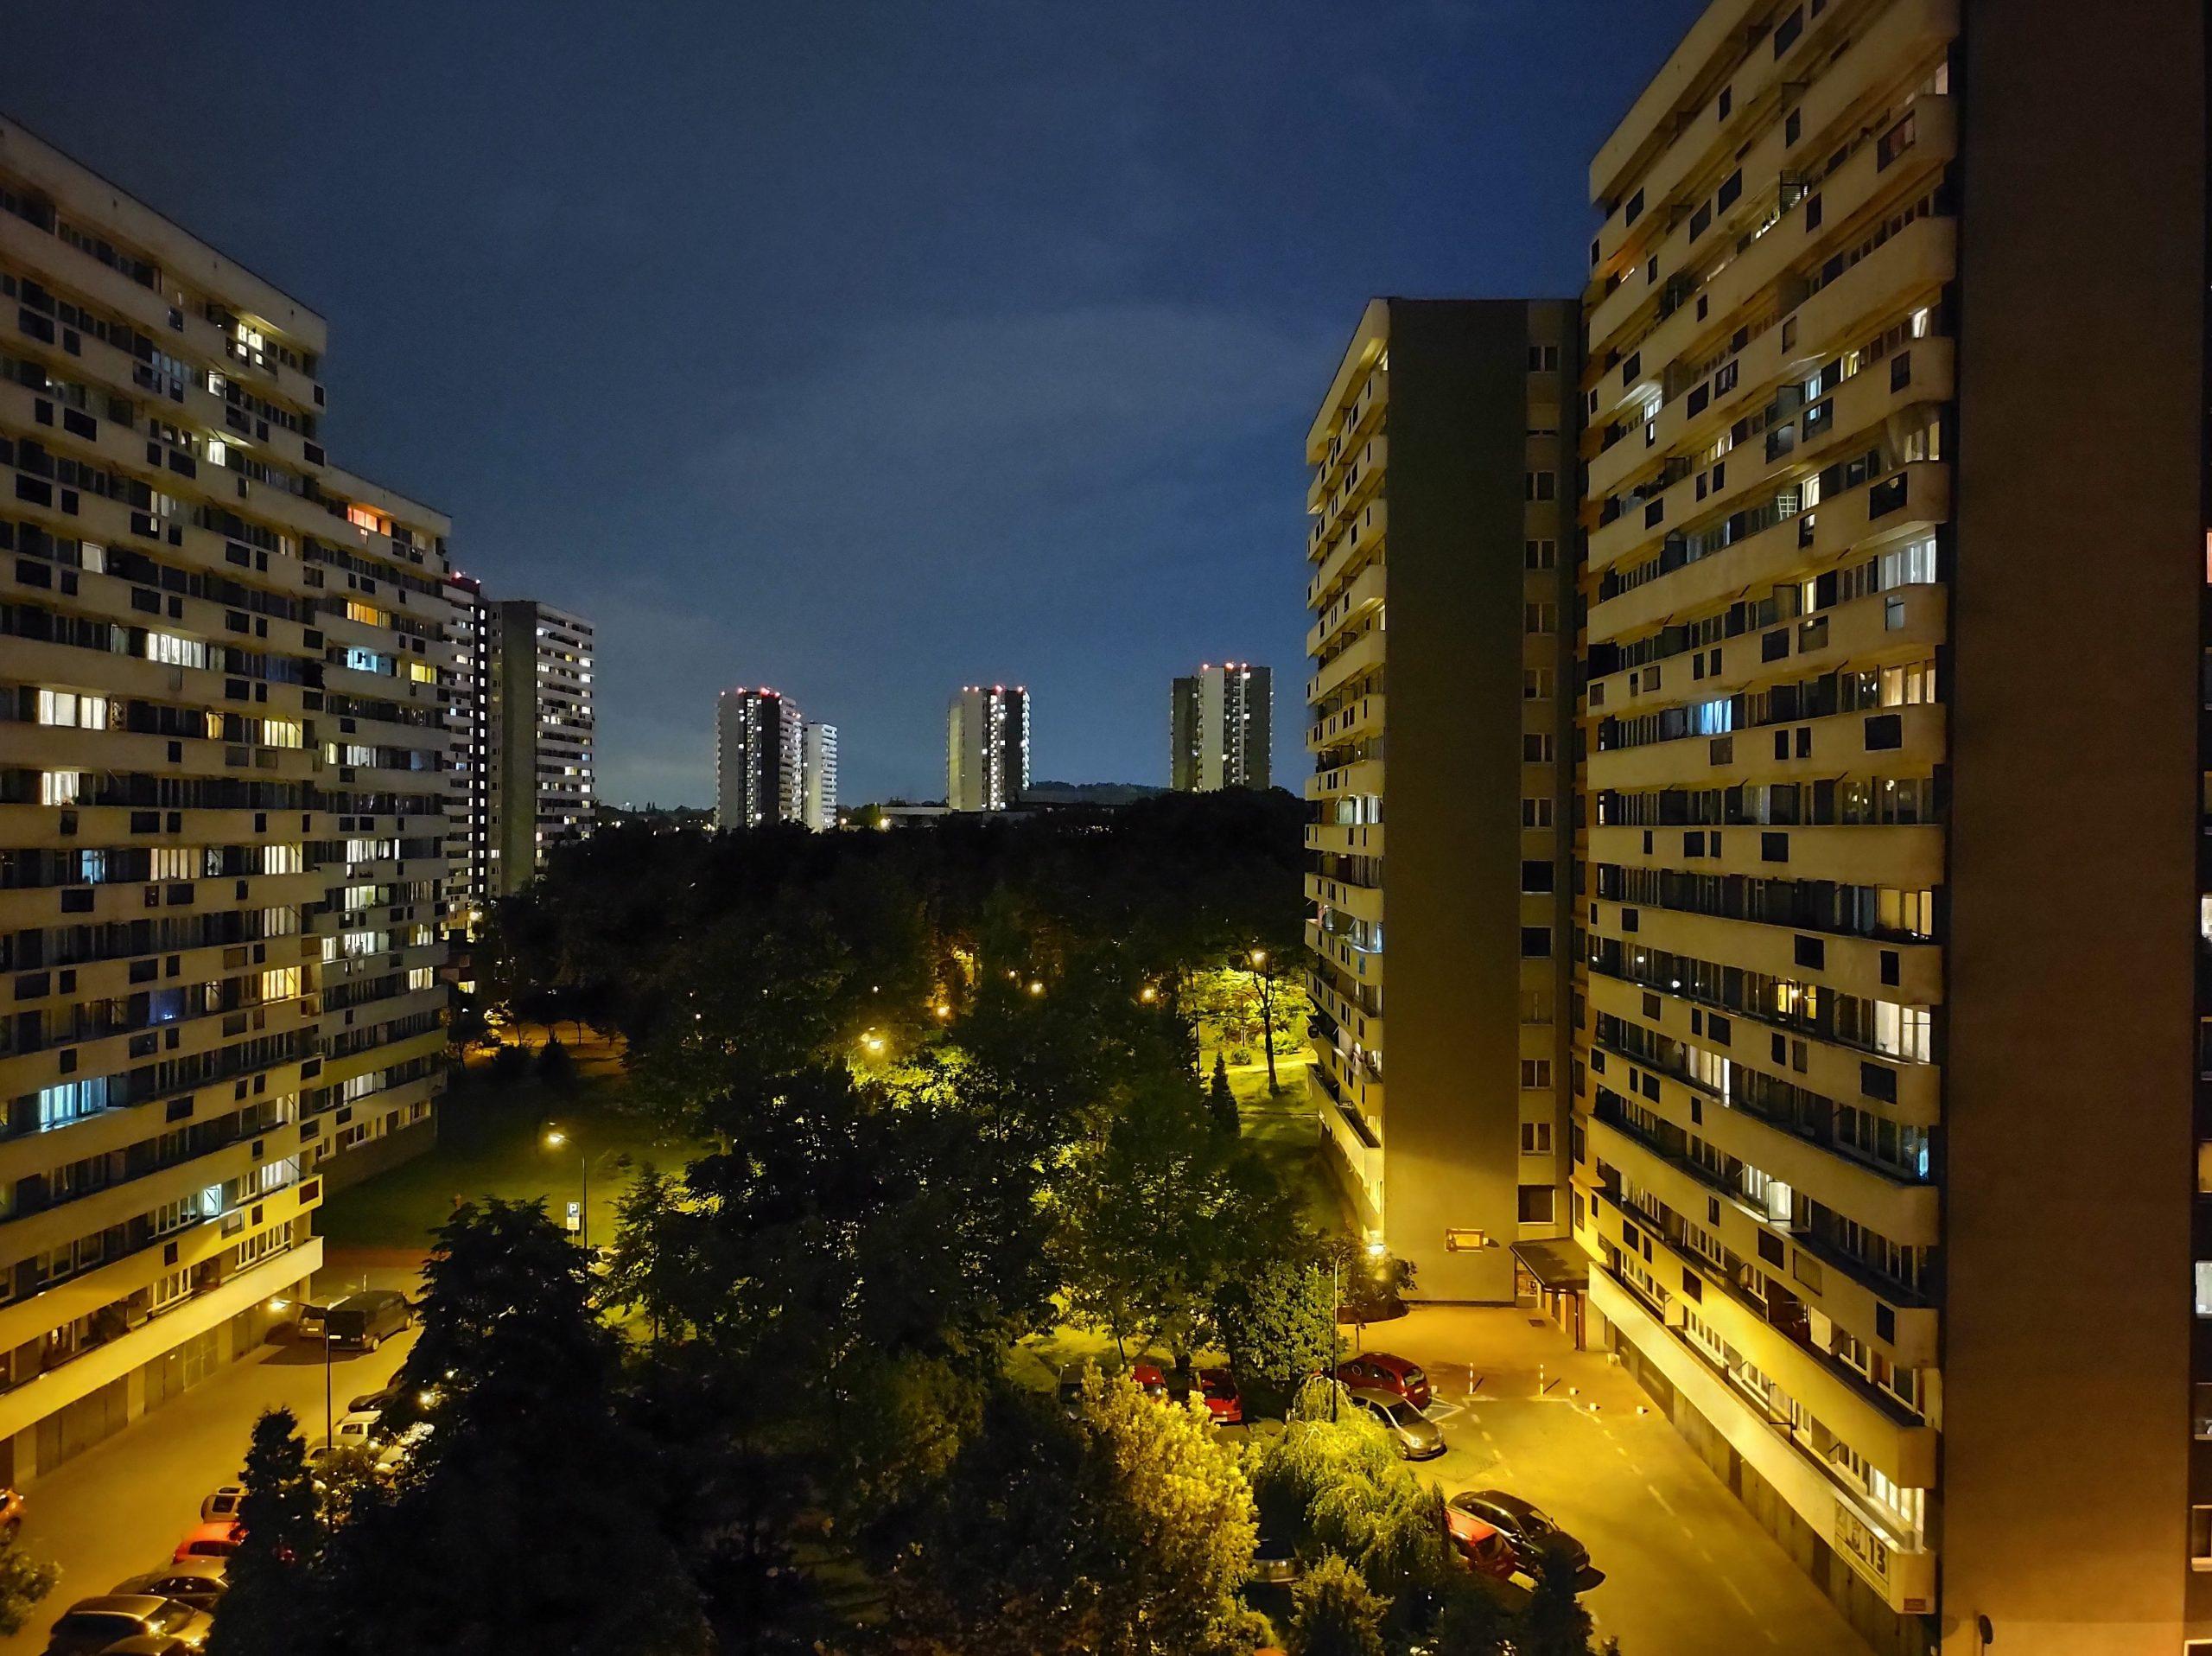 Zdjęcia nocne - Motorola Edge